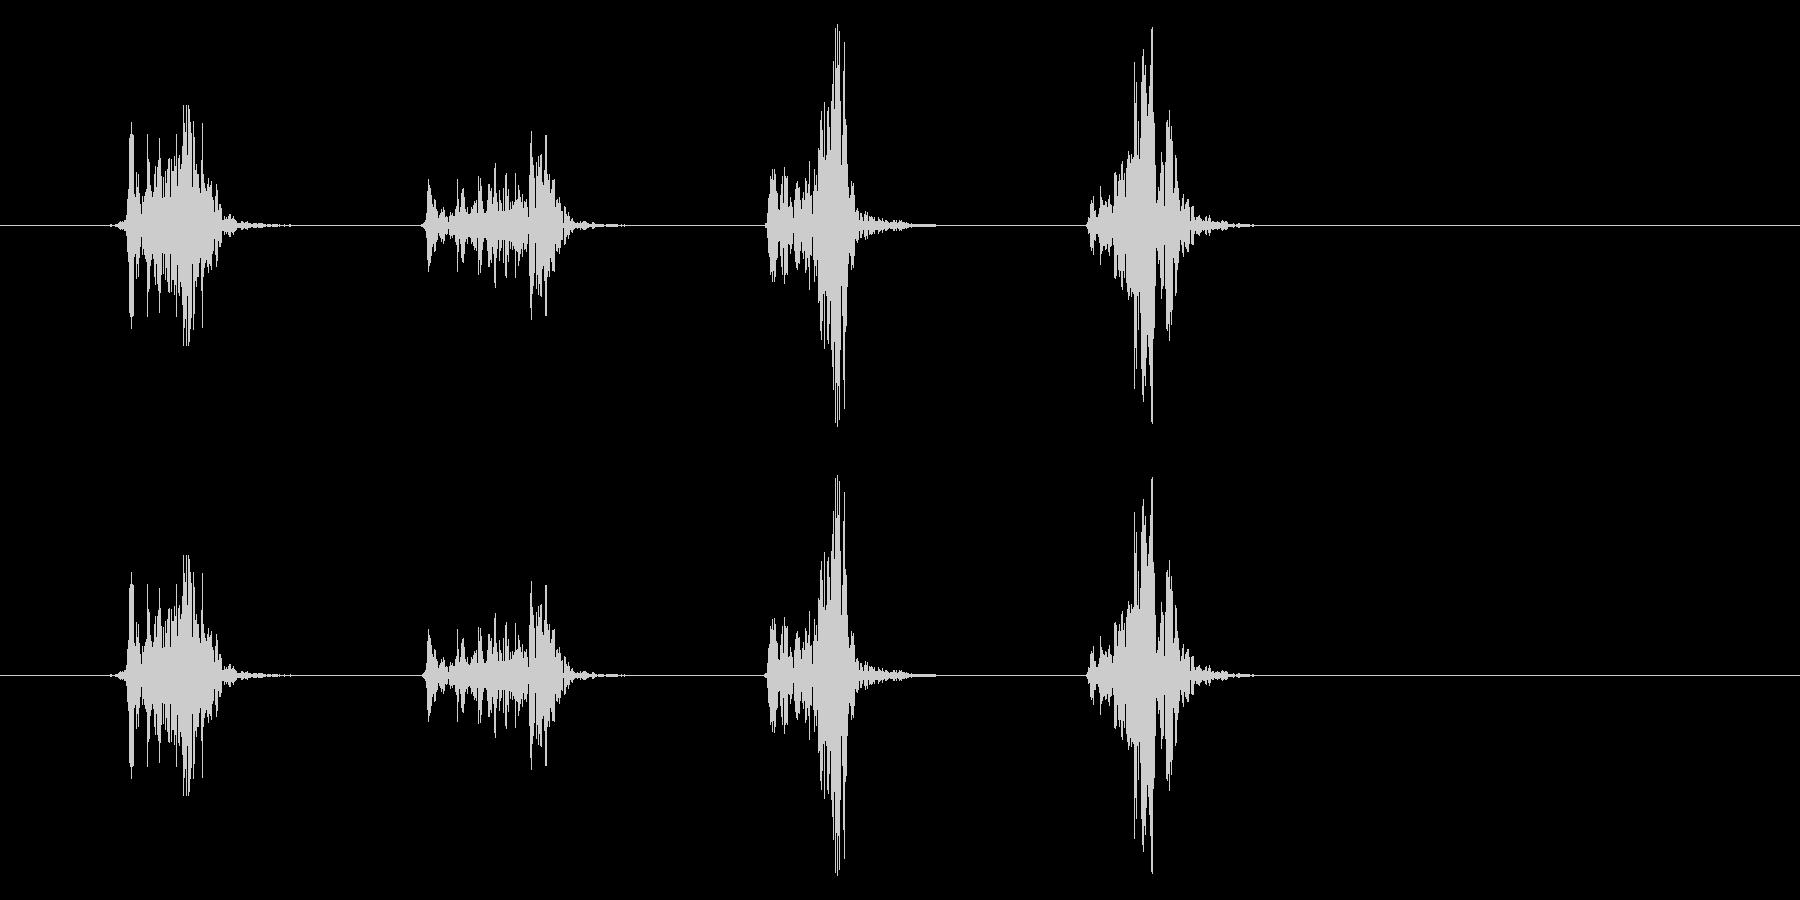 PC マウス03-19(スクロール 速)の未再生の波形